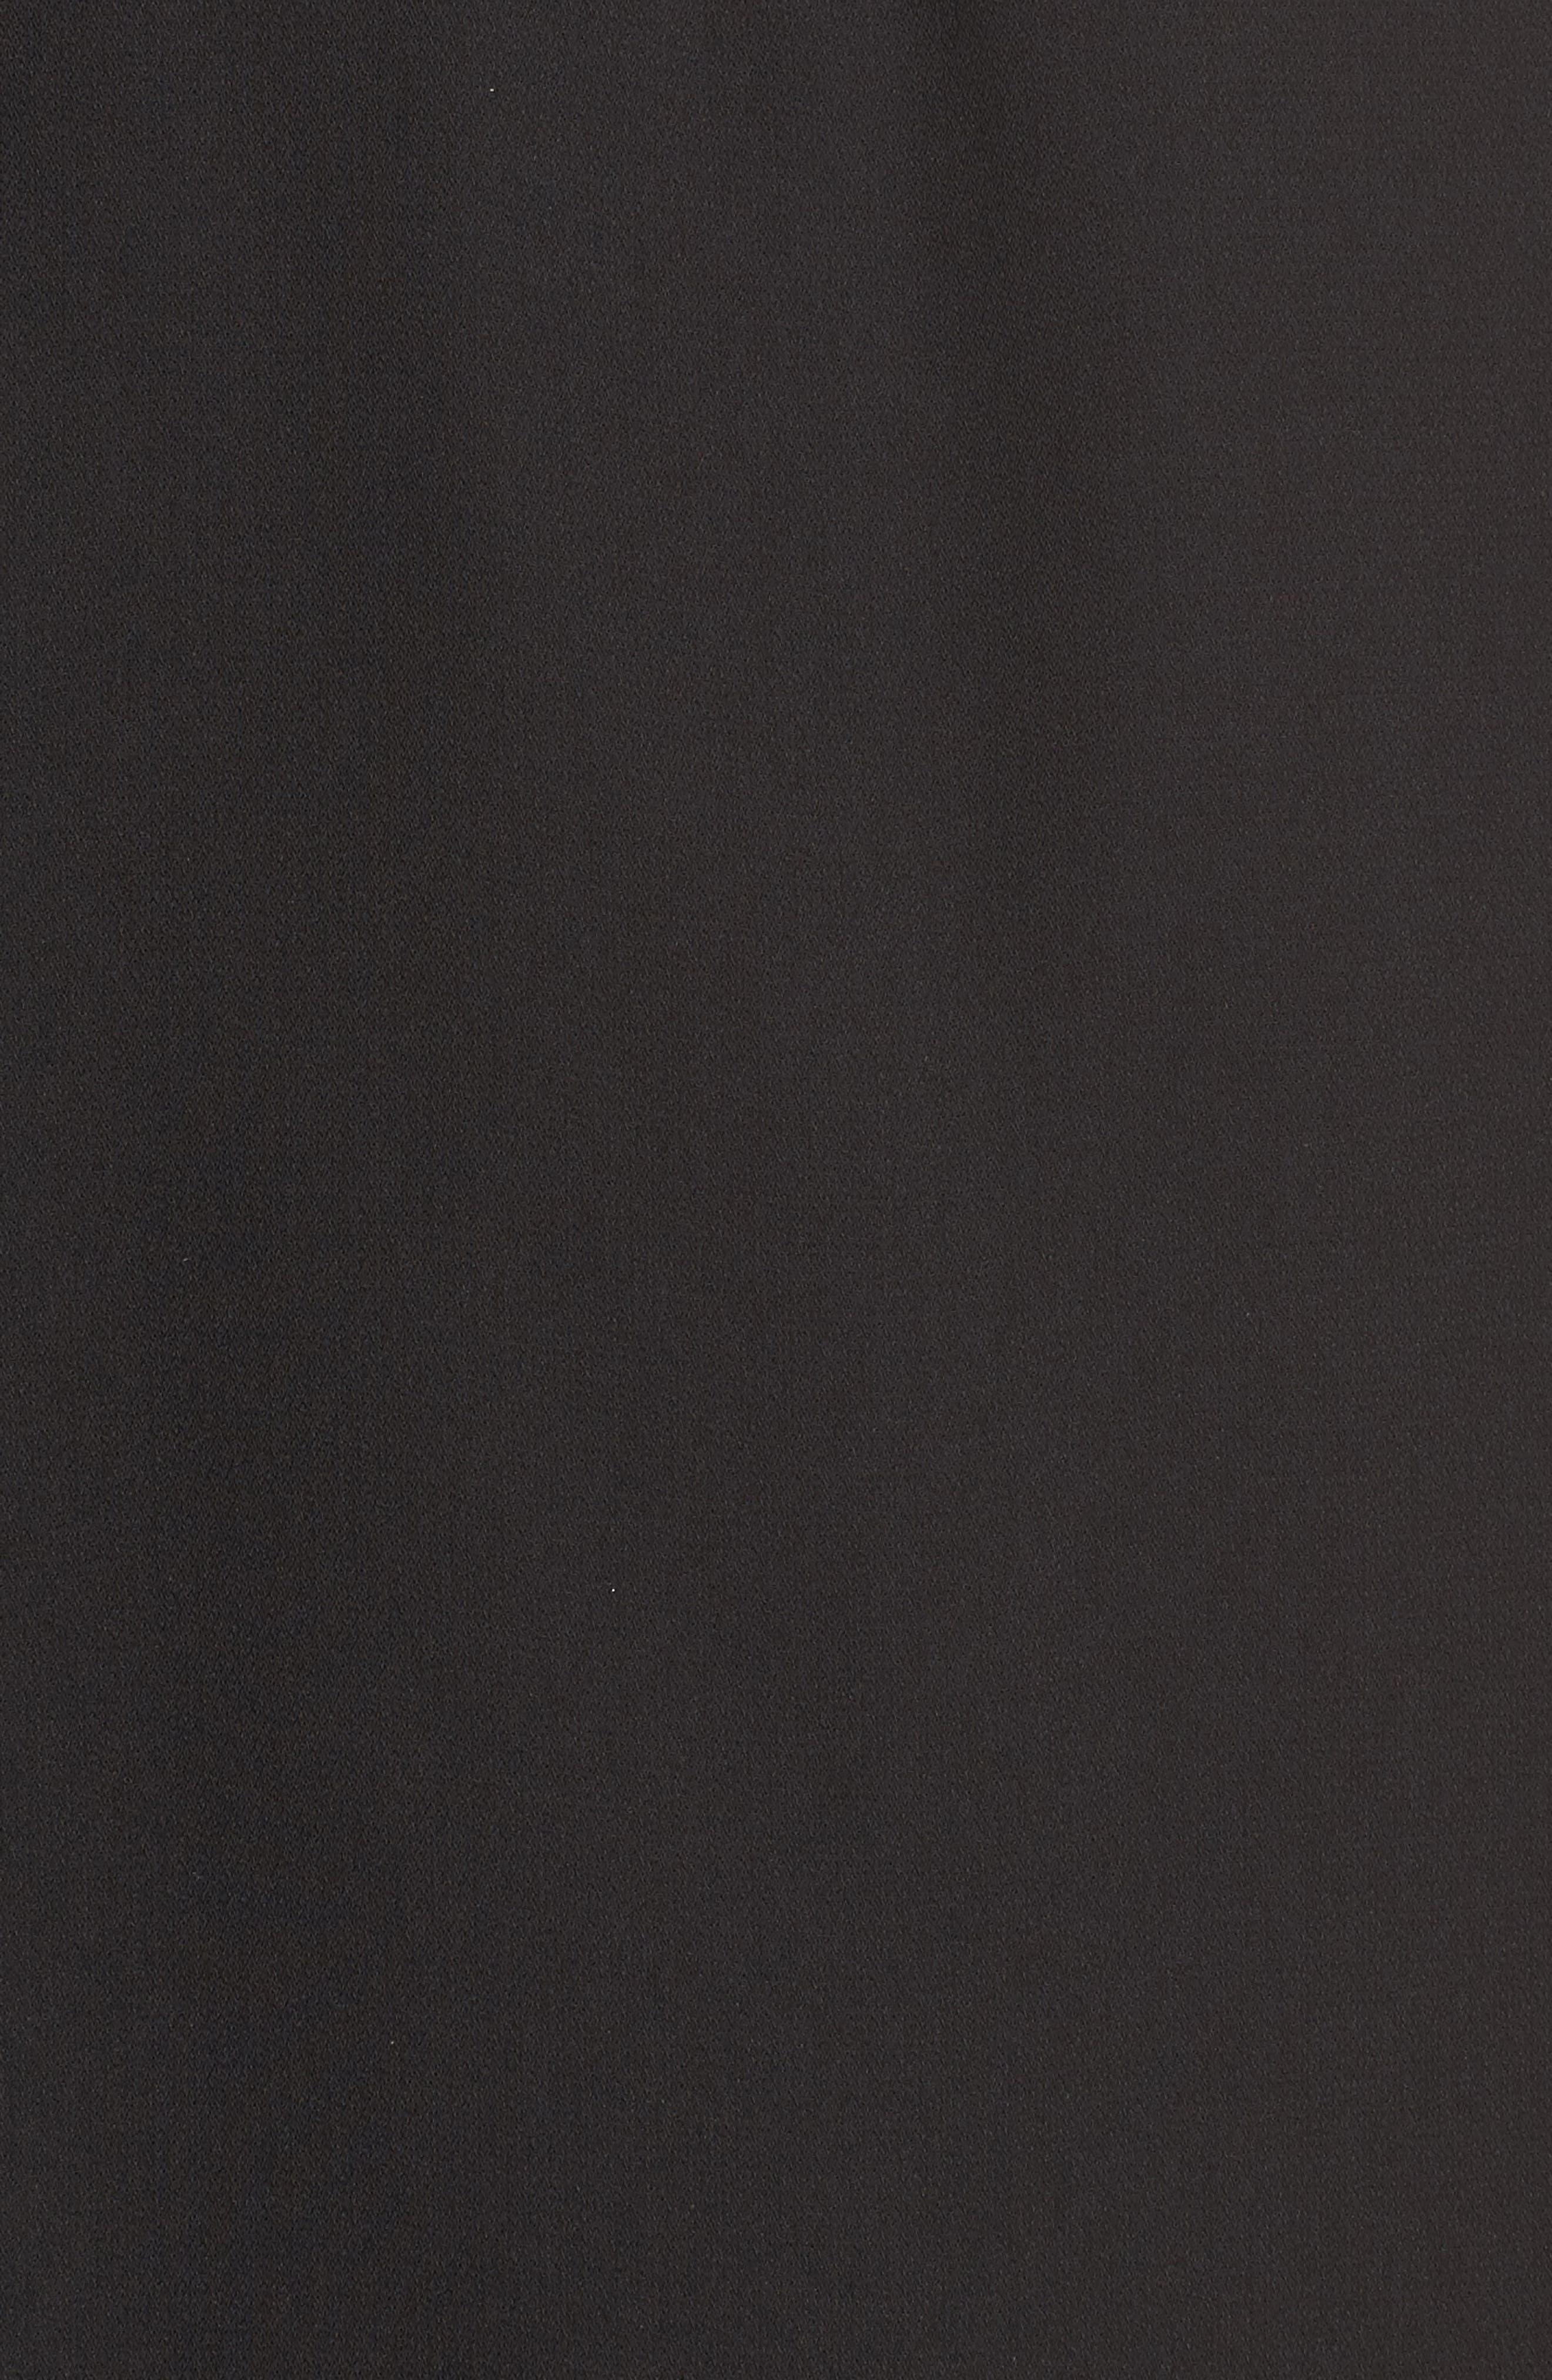 Muse Off the Shoulder Minidress,                             Alternate thumbnail 6, color,                             Black